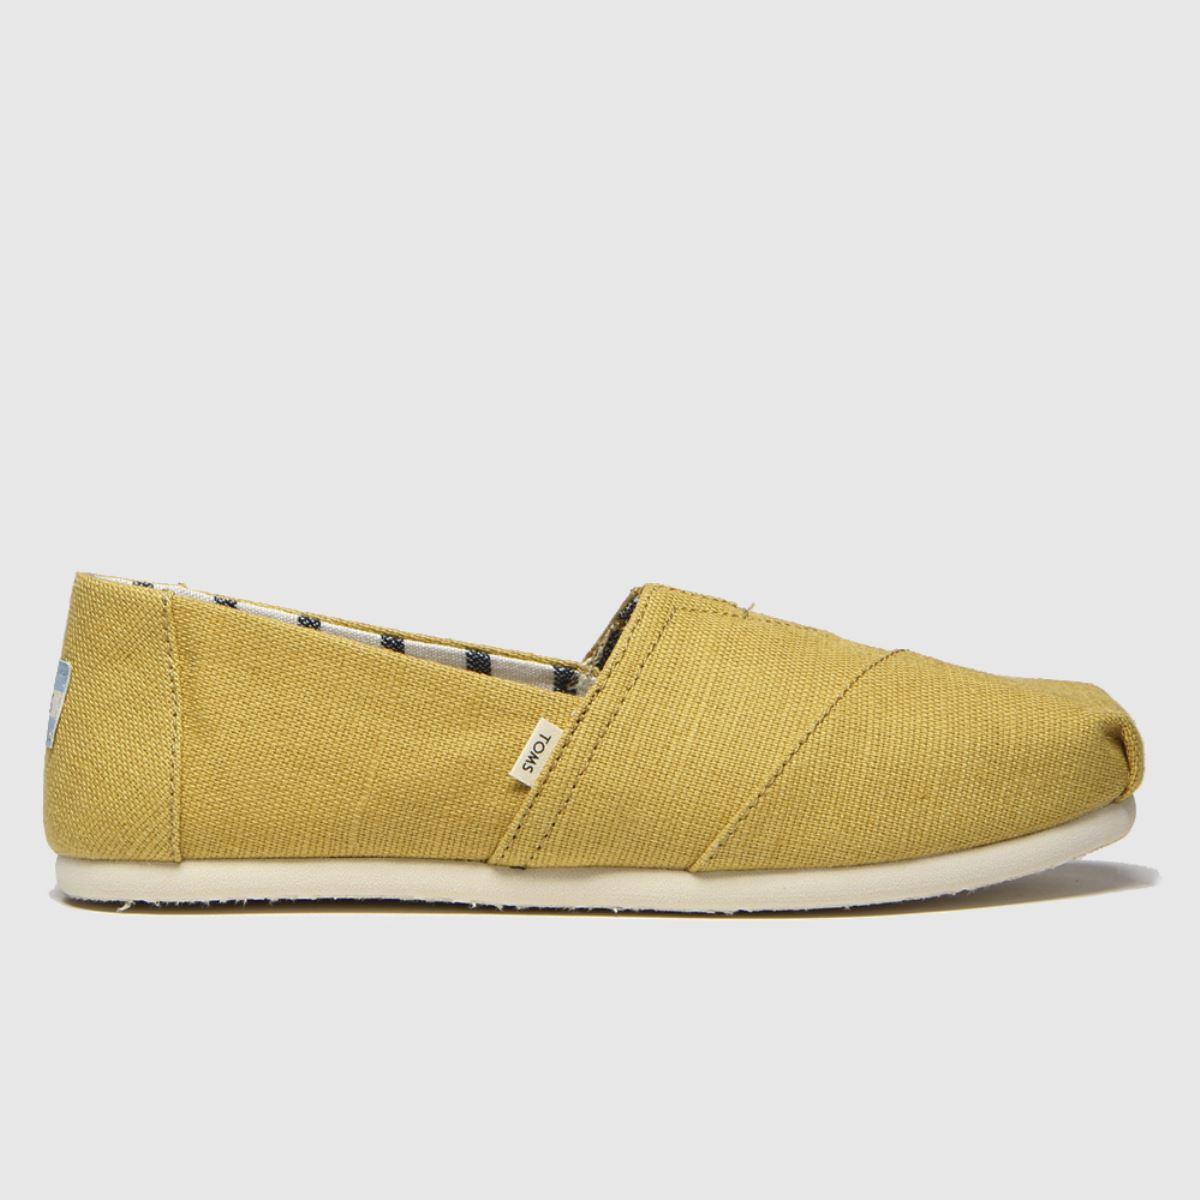 Toms Yellow Alpargata Venice Flat Shoes